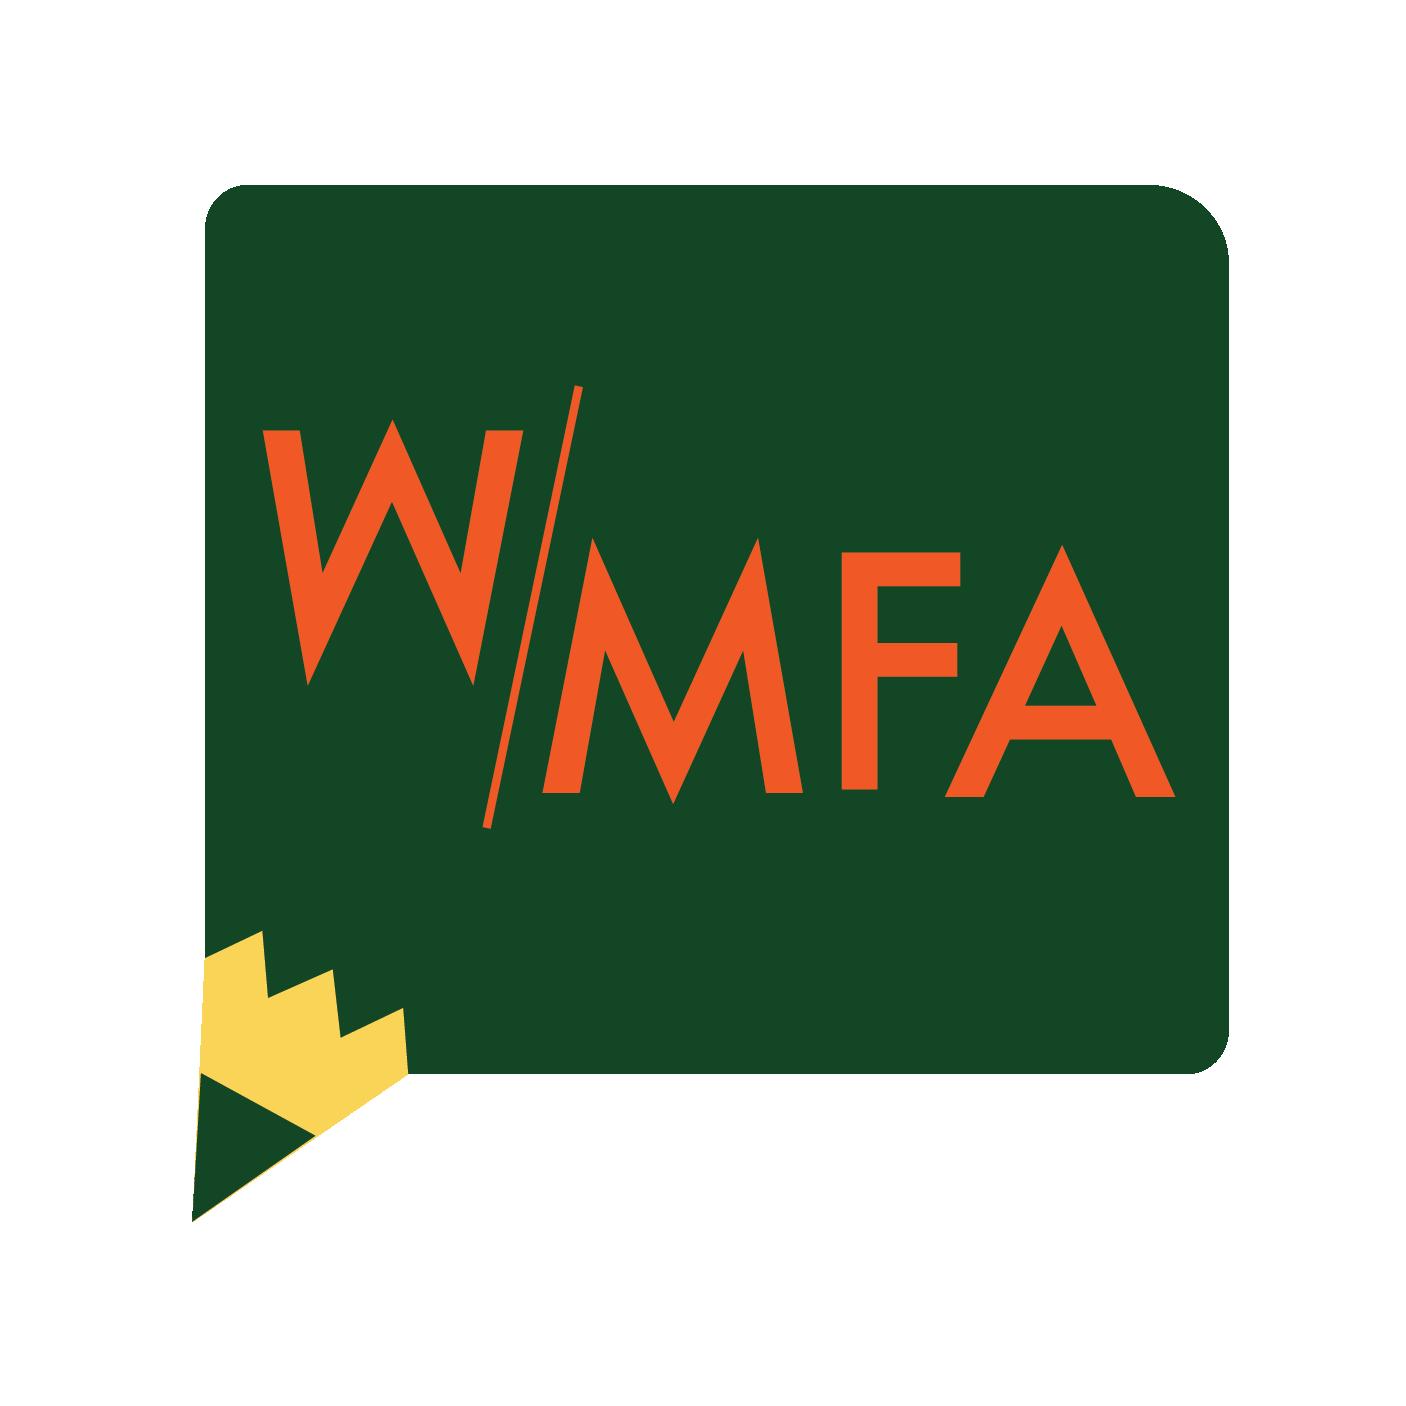 WMFA_nobackground-01.png